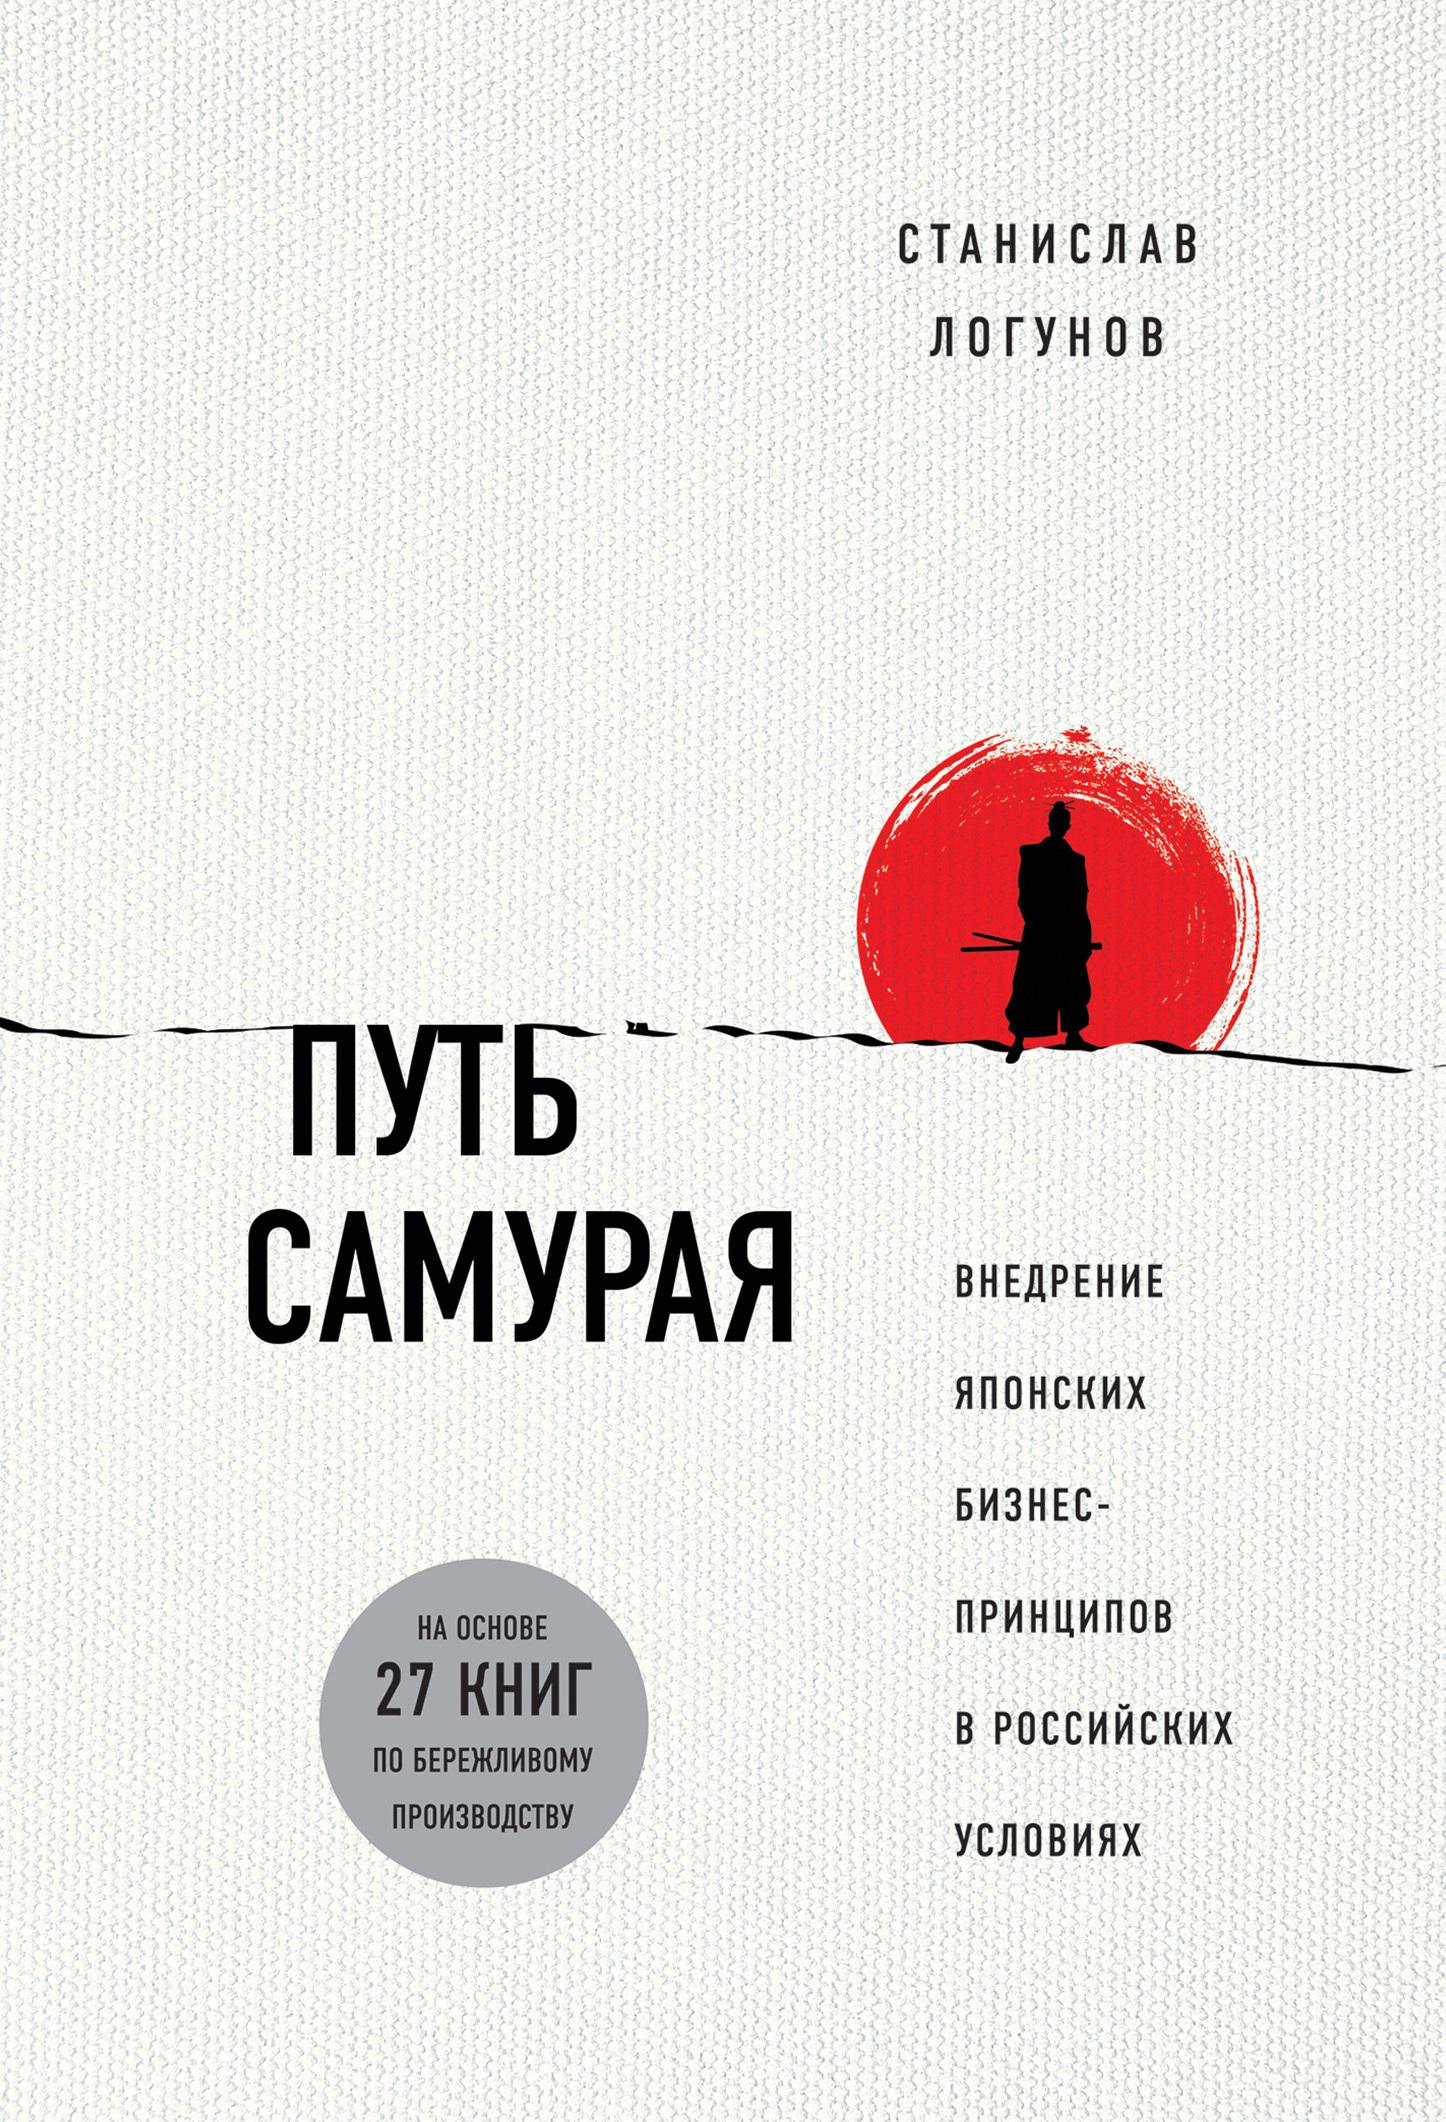 Обложка книги. Автор - Станислав Логунов